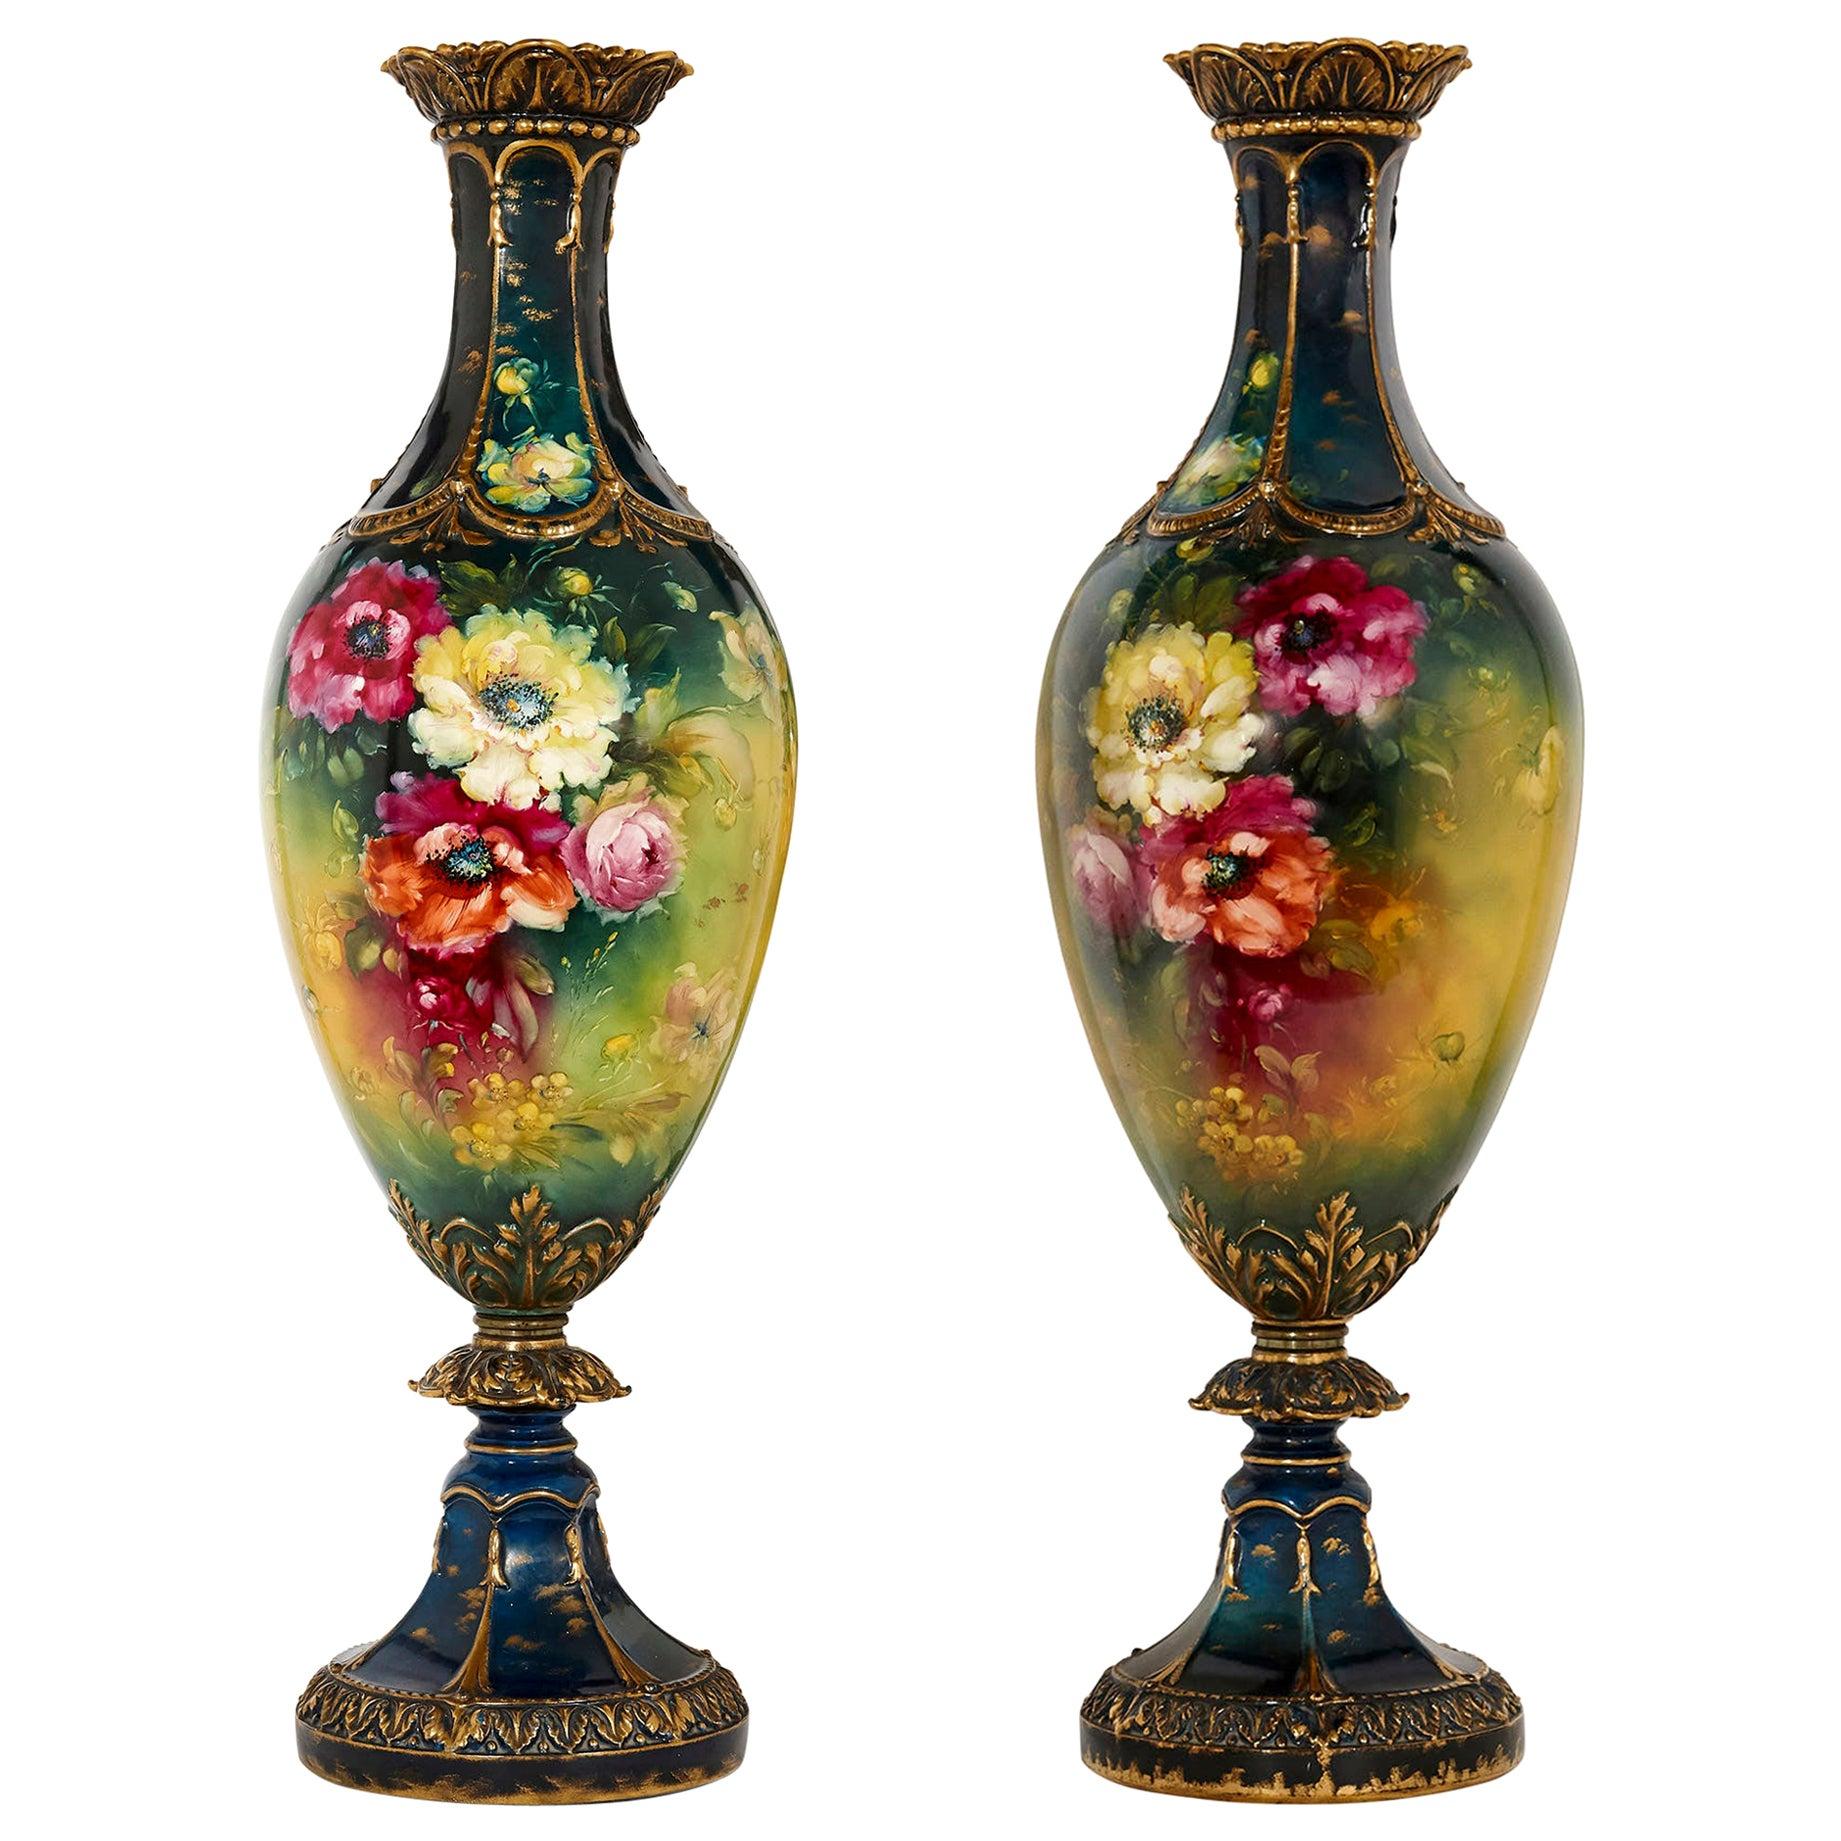 Very Large Pair of Porcelain Vases by Royal Bonn, Germany